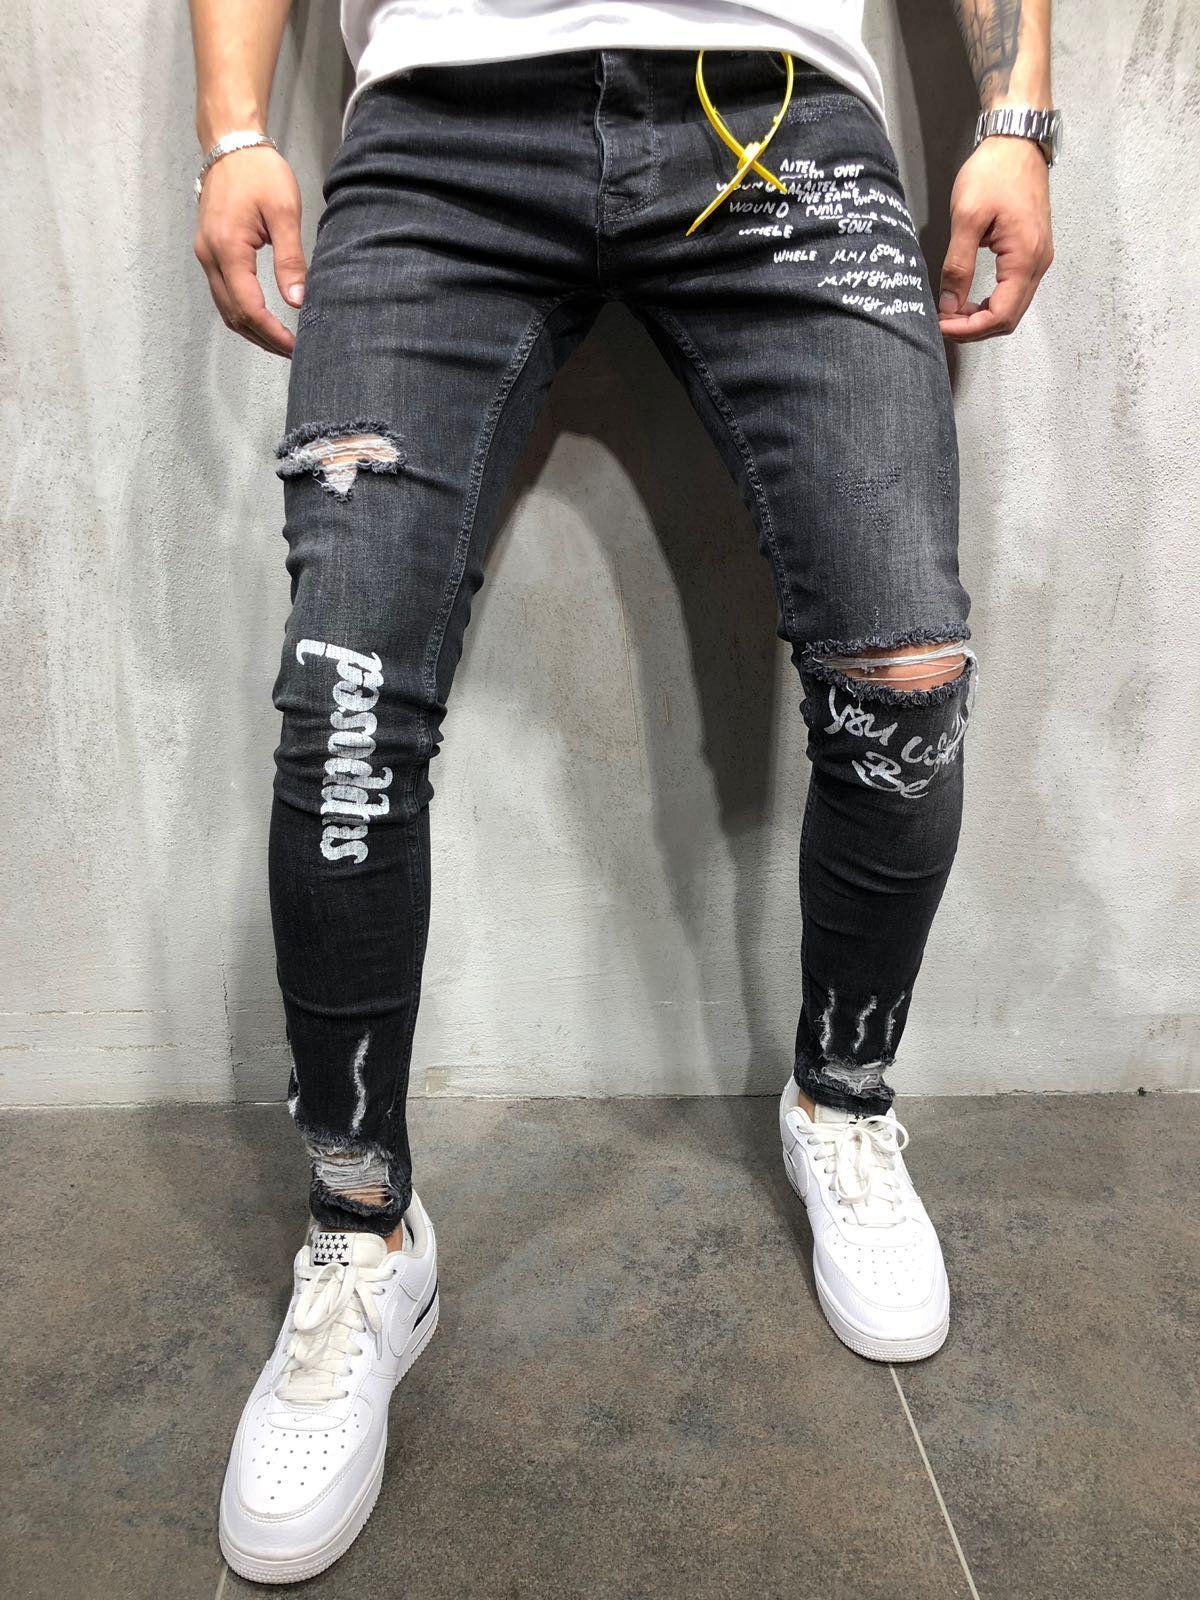 4bd493b2e34 KAYDENK Men39s PU Side Stripe Destroyed Ankle Zip Skinny Jeans